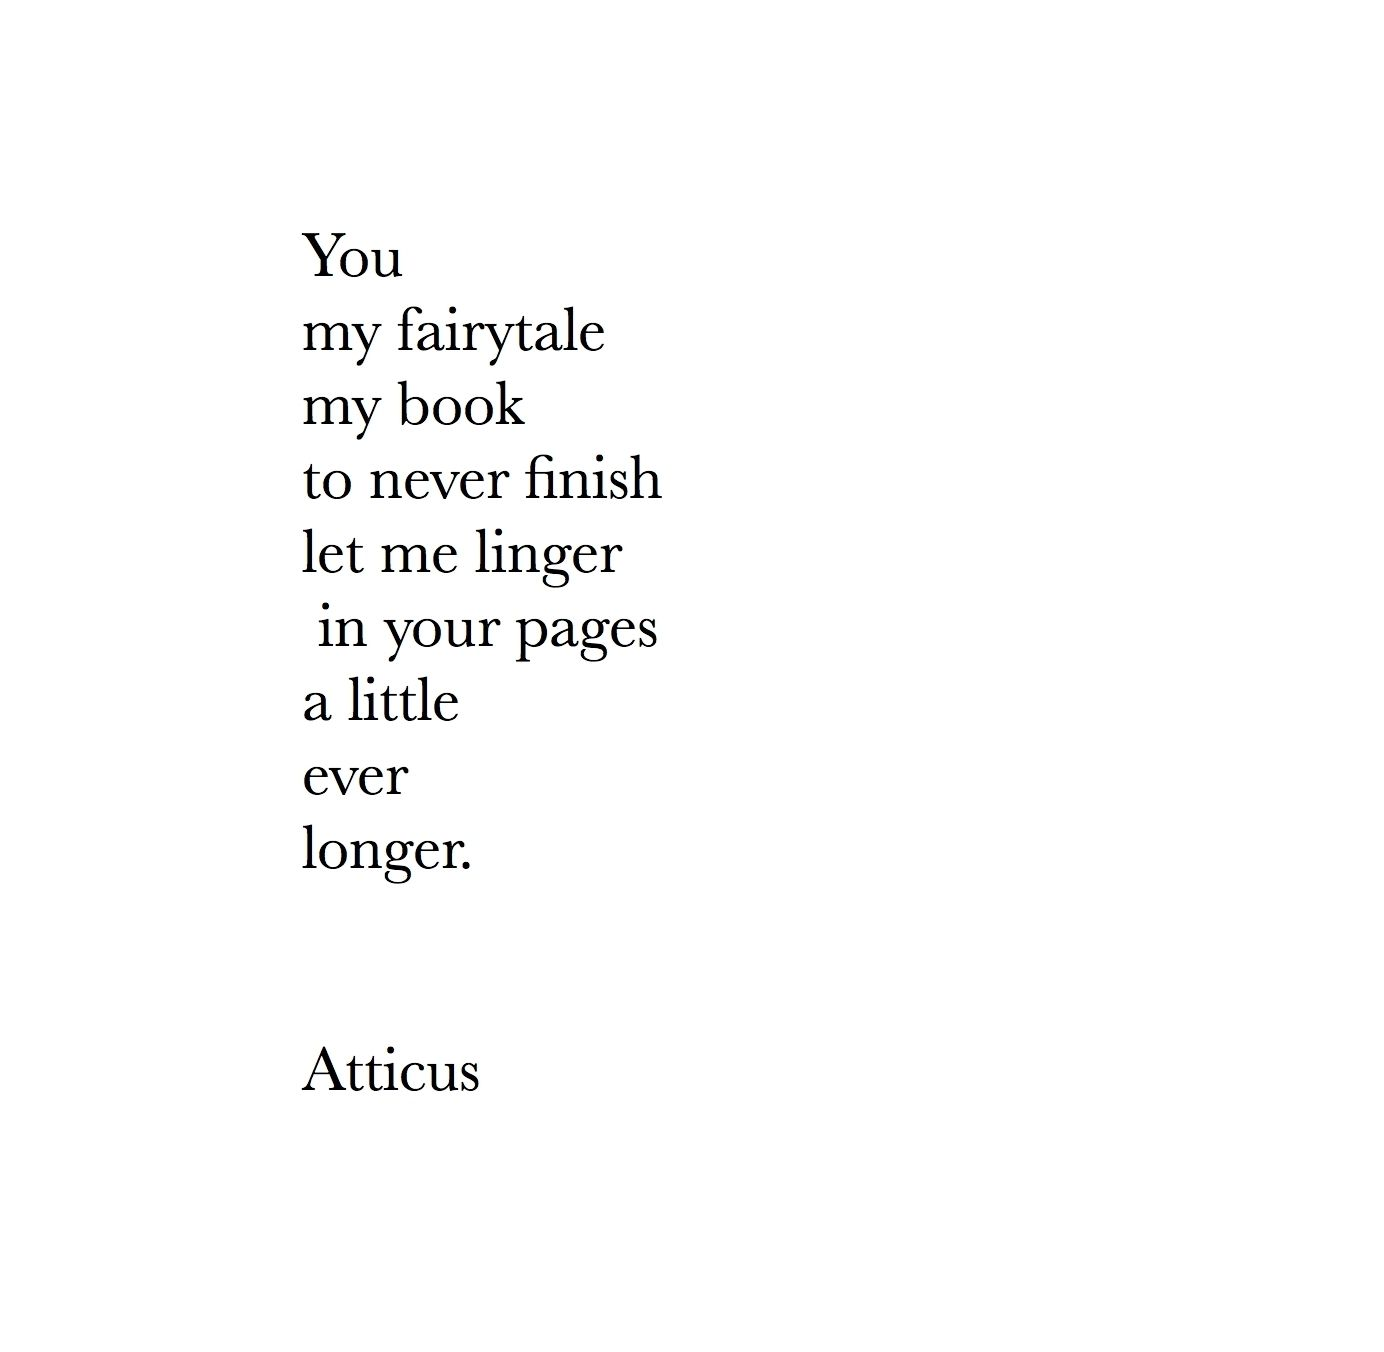 My Fairytale Atticuspoetry Atticus Poetry Fairytale